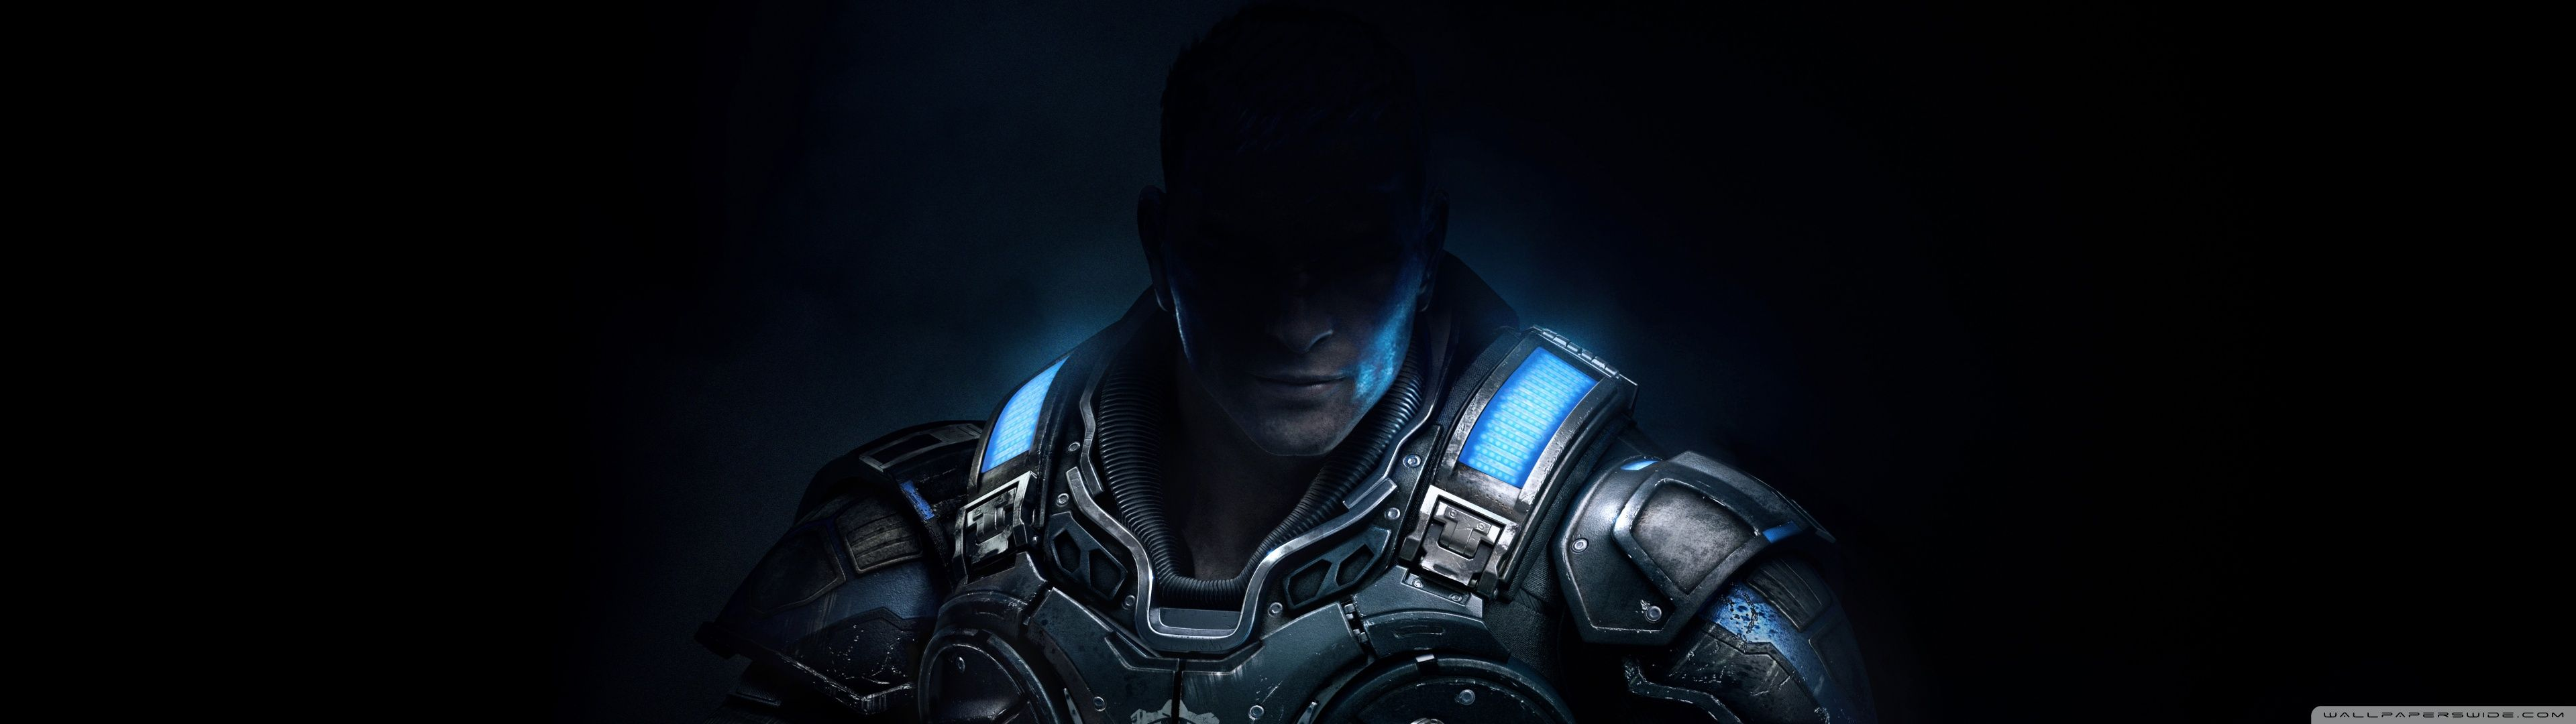 Gears Of War 4 3840x1080